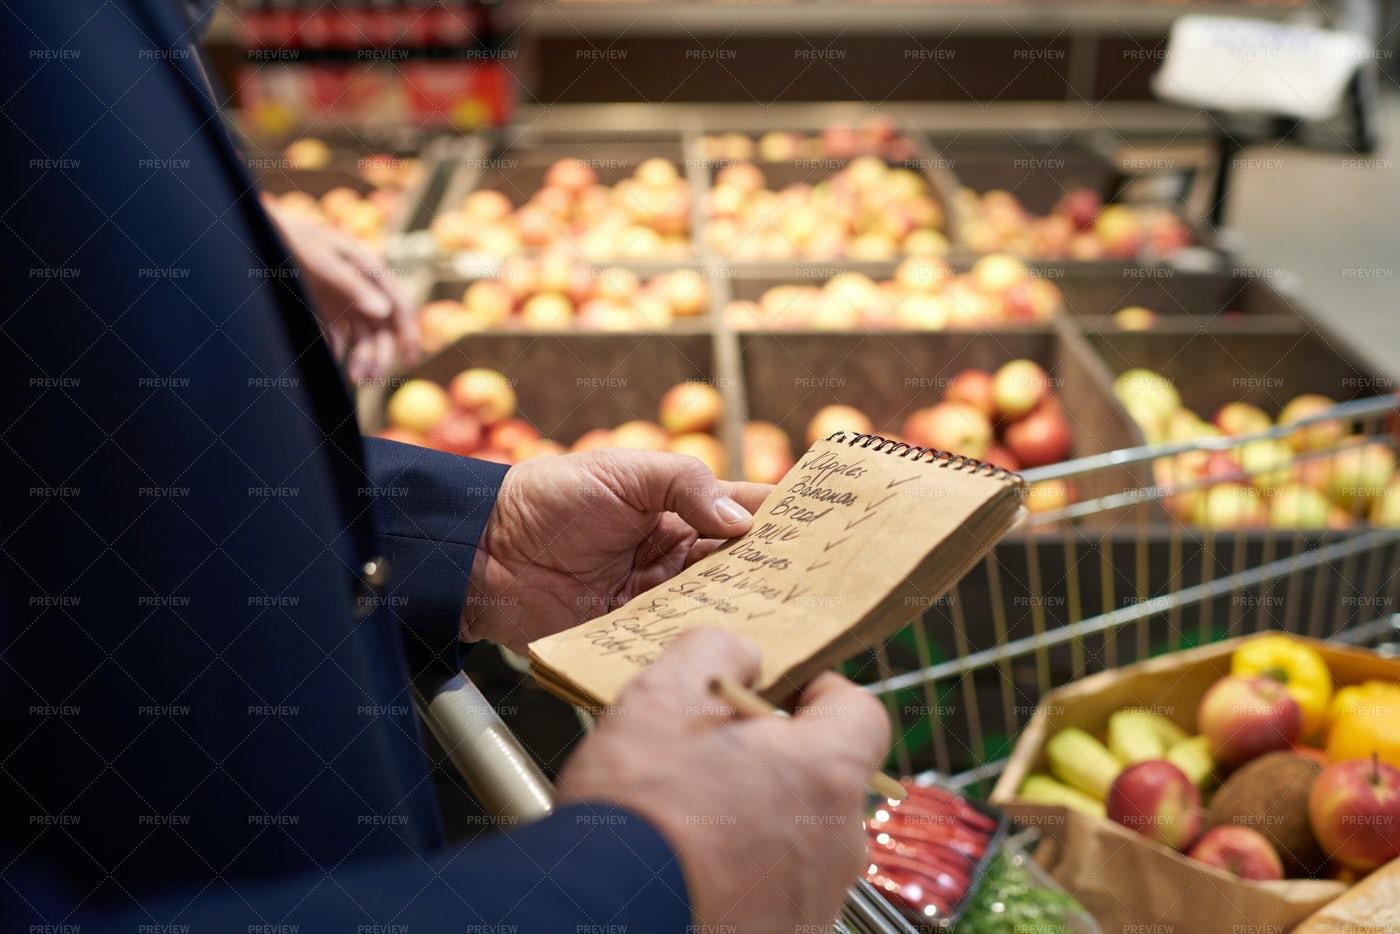 Senior Man Holding Shopping List: Stock Photos